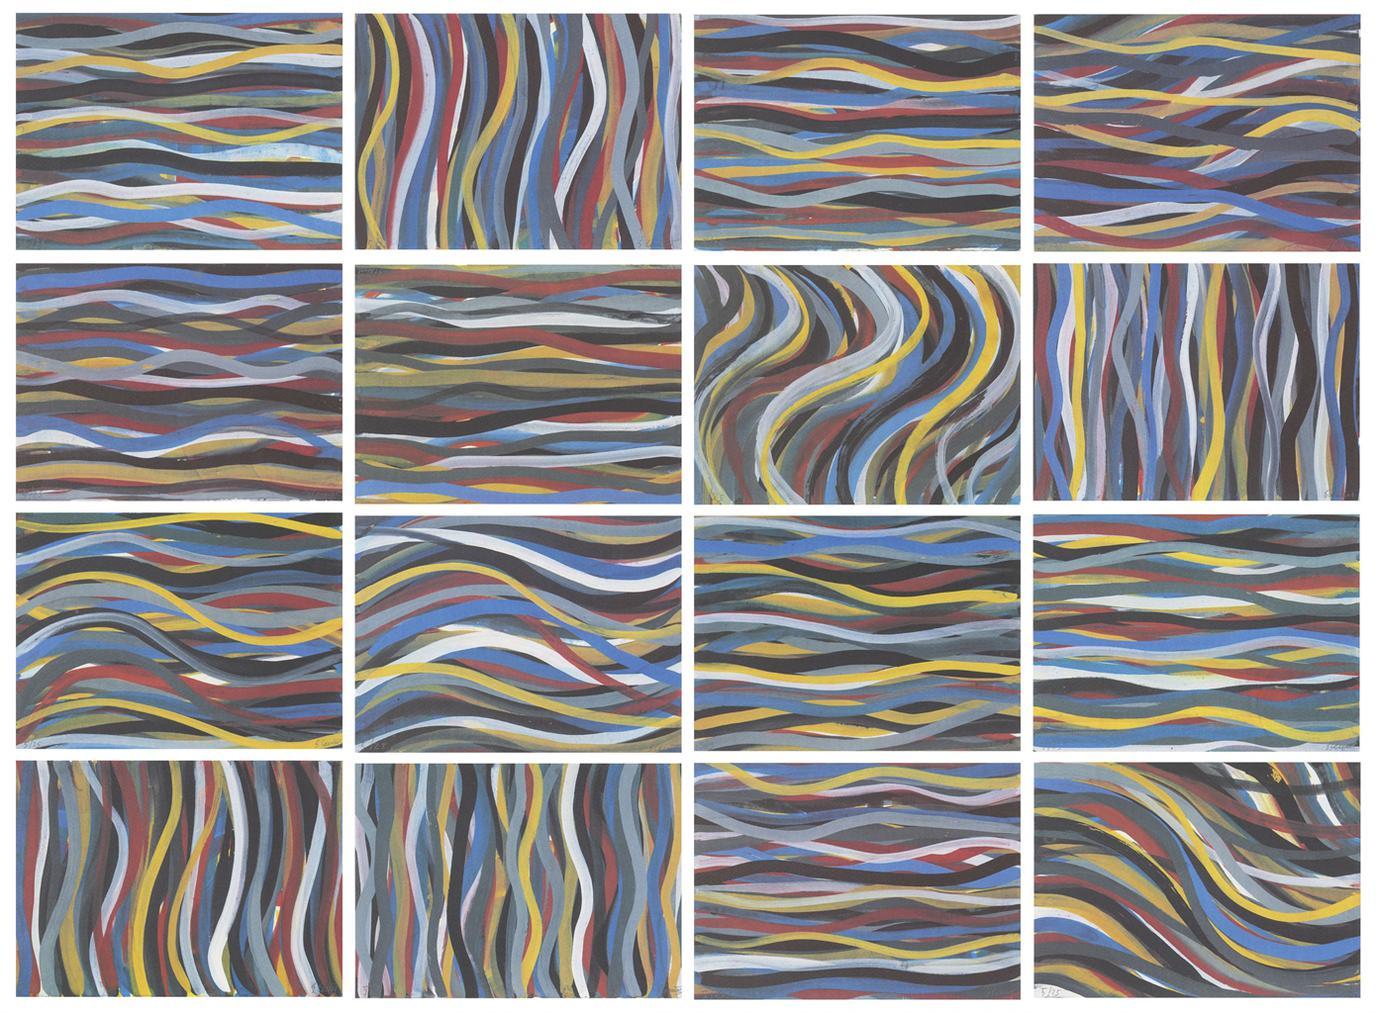 Sol LeWitt-Brushtrokes: Horizontal And Vertical-1996